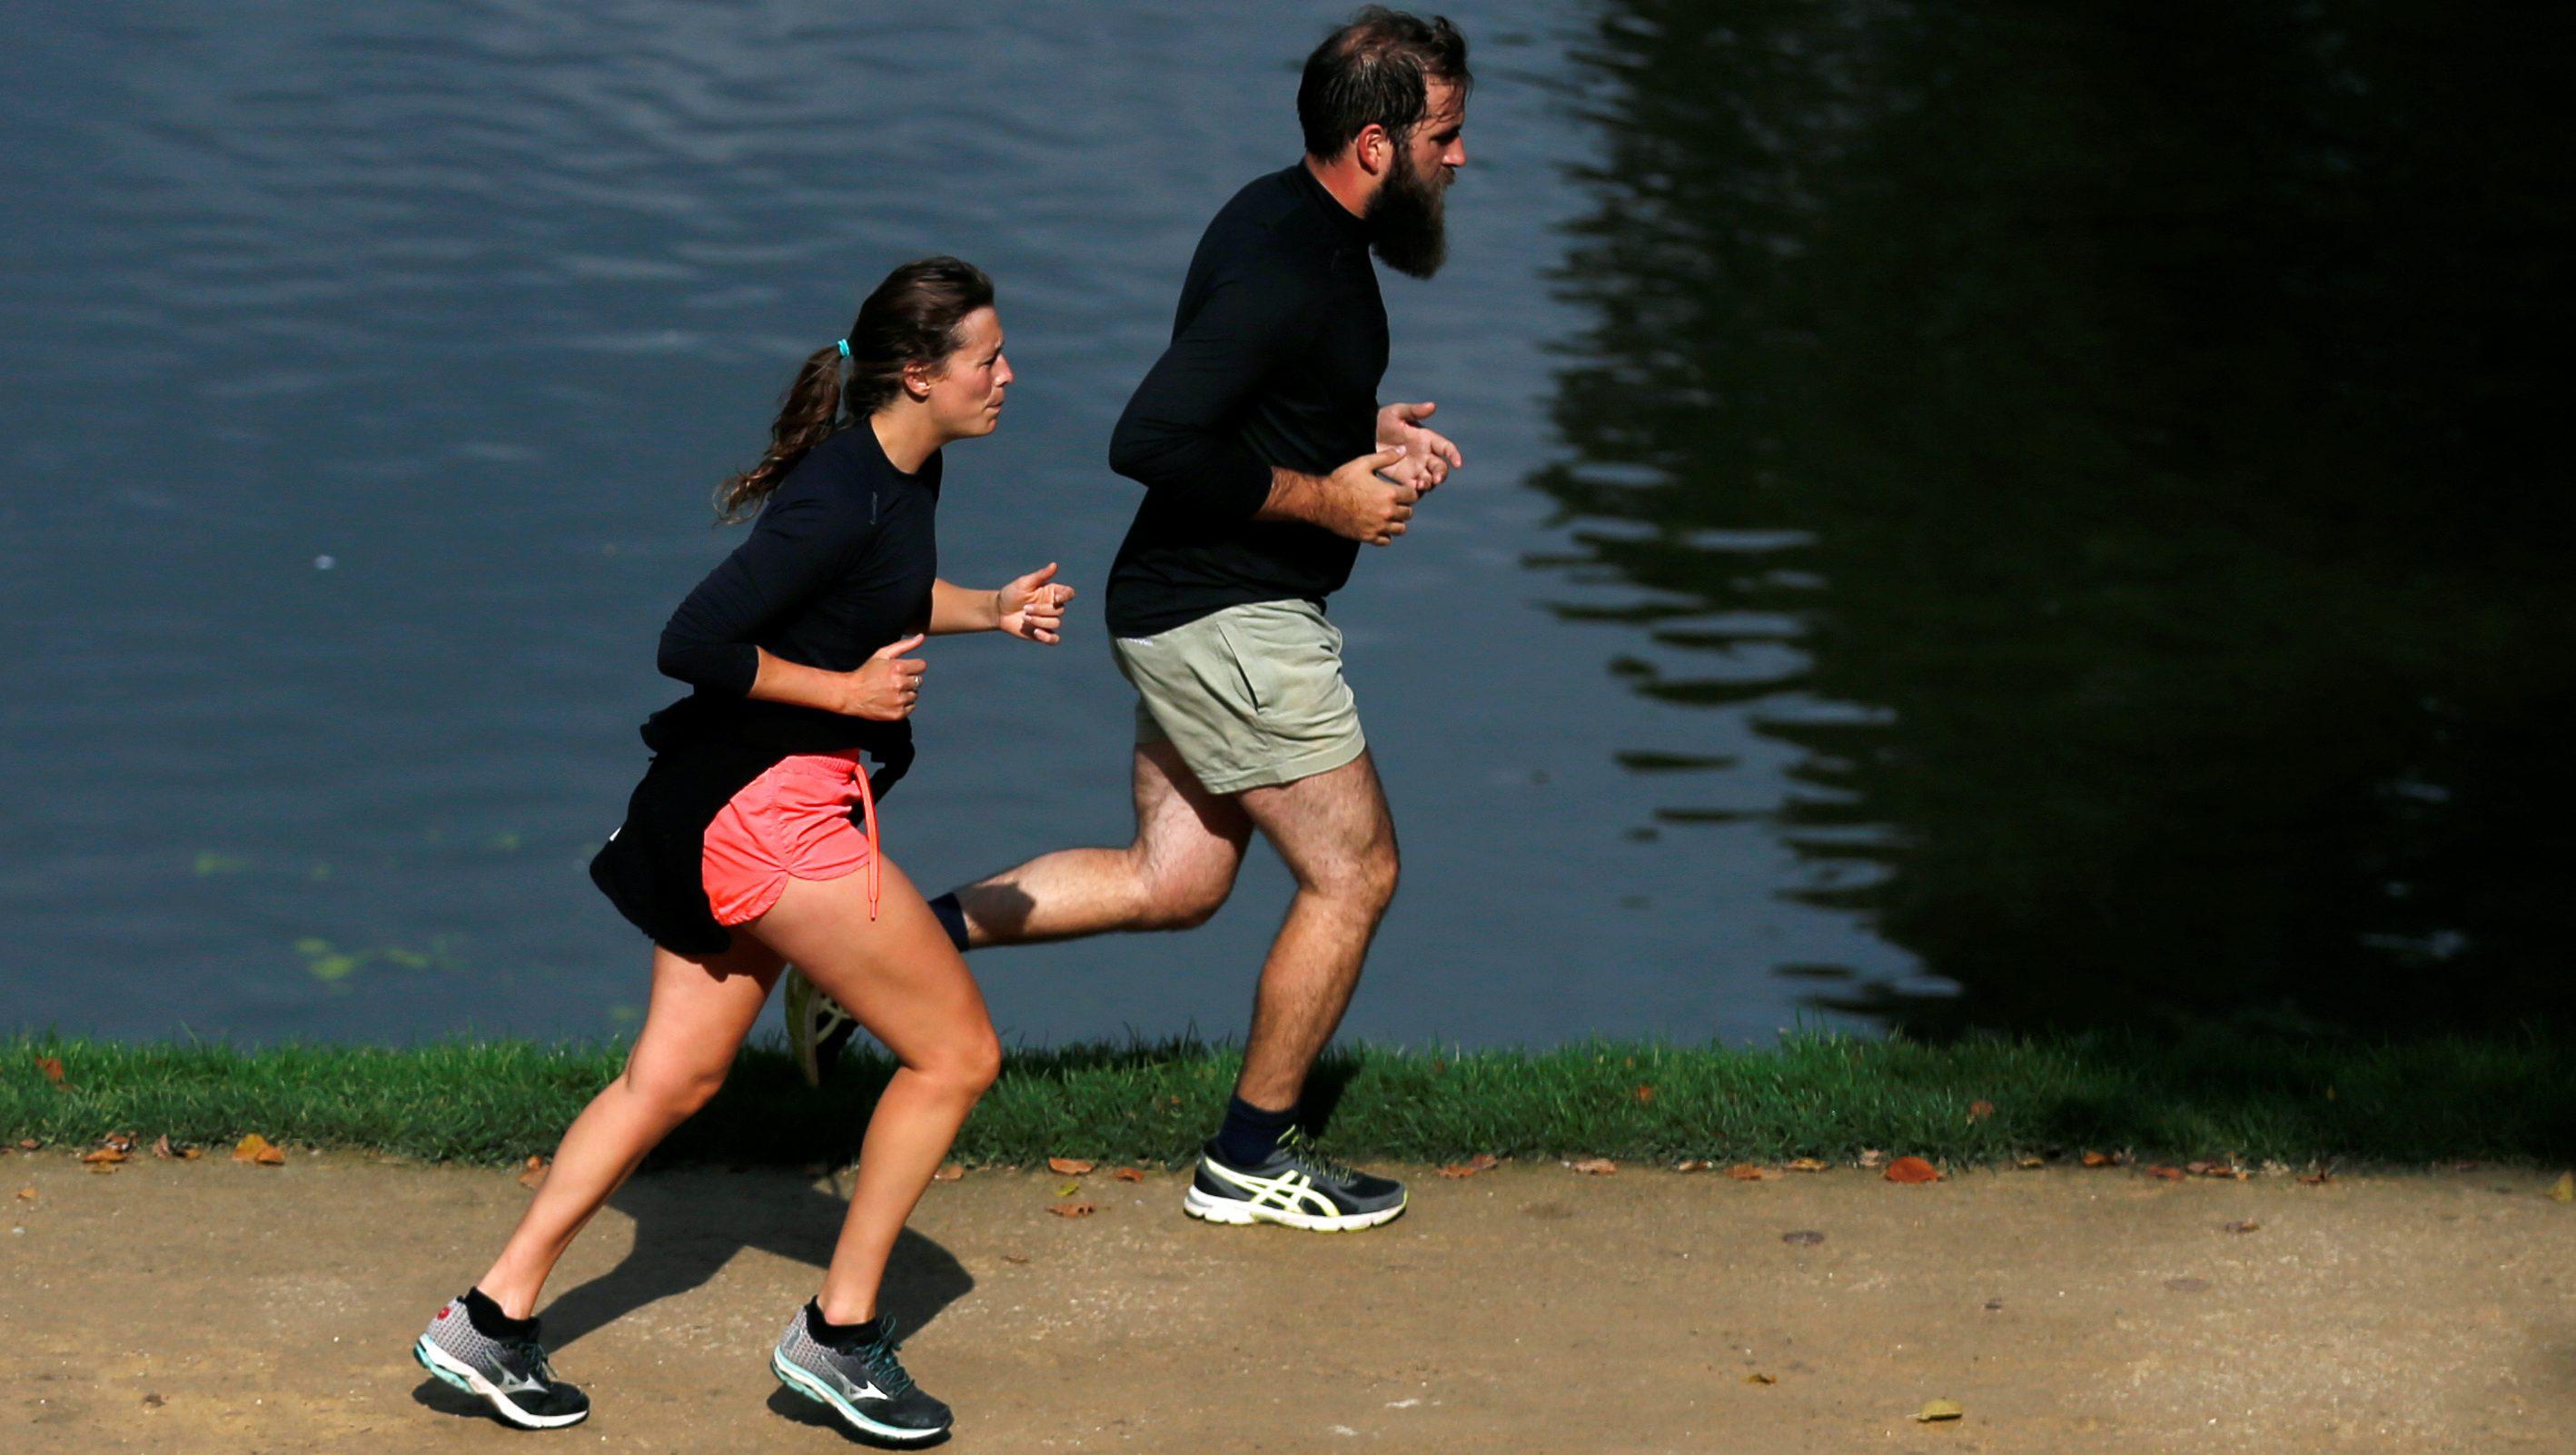 People jog in a public park in Brussels